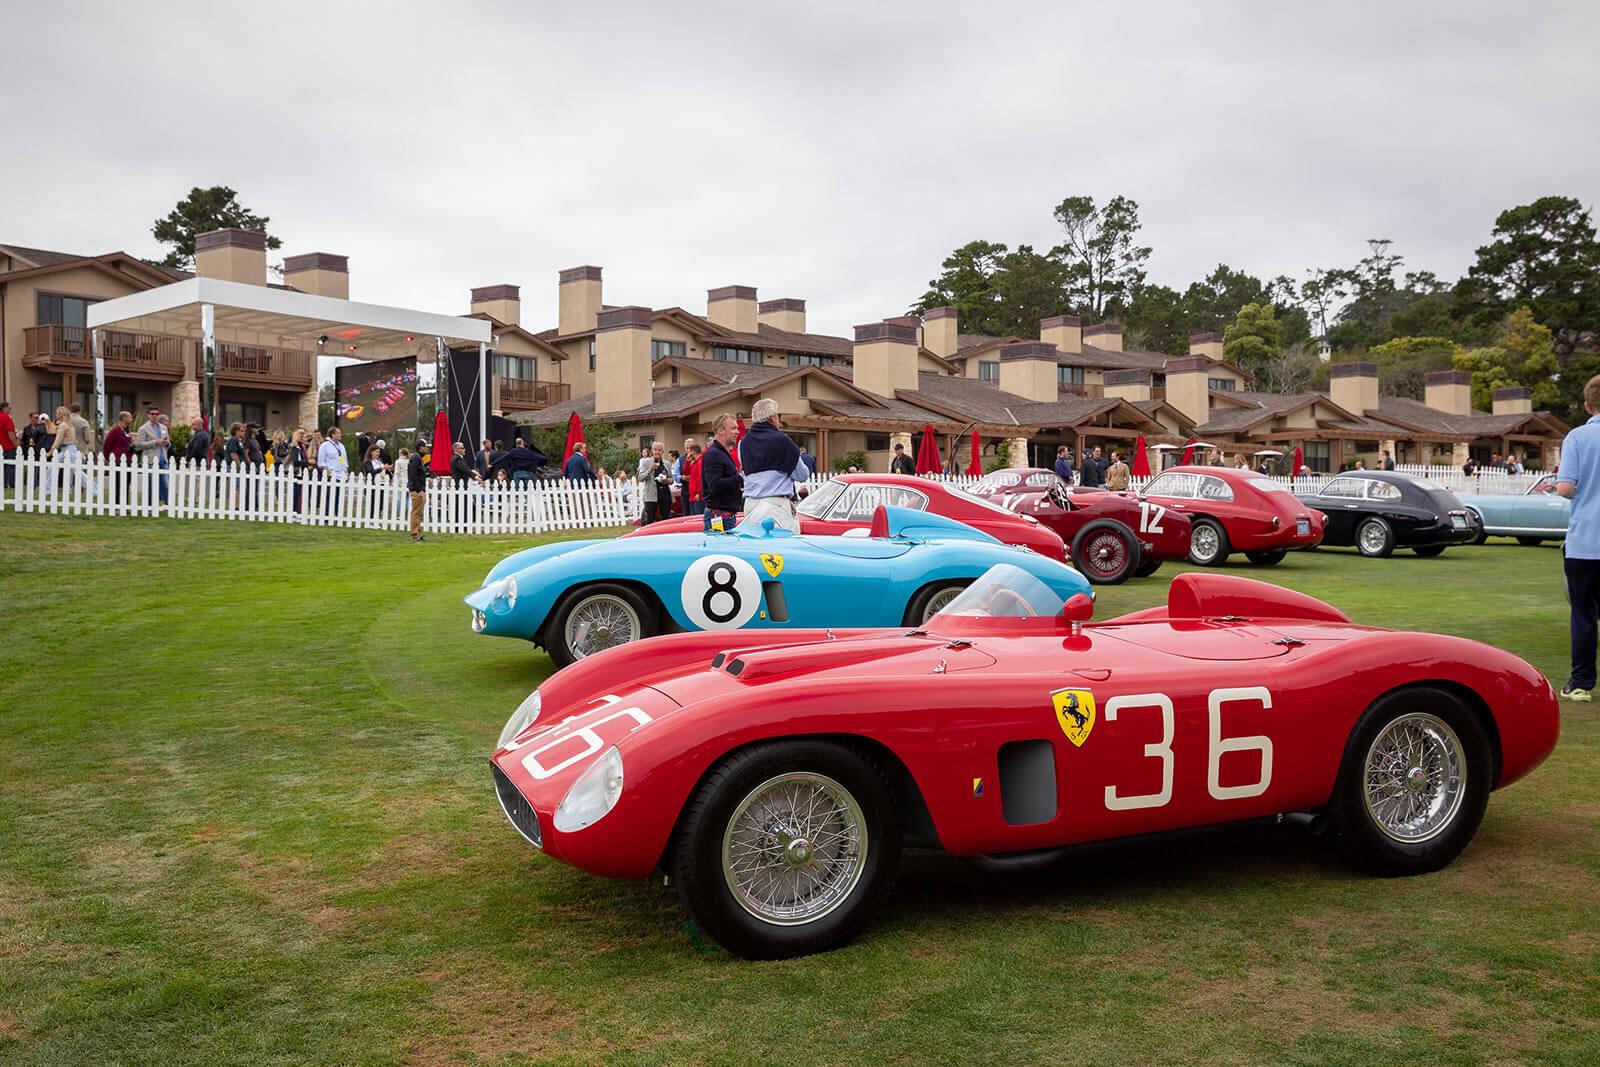 Ferrari Concours at Pebble Beach Concours